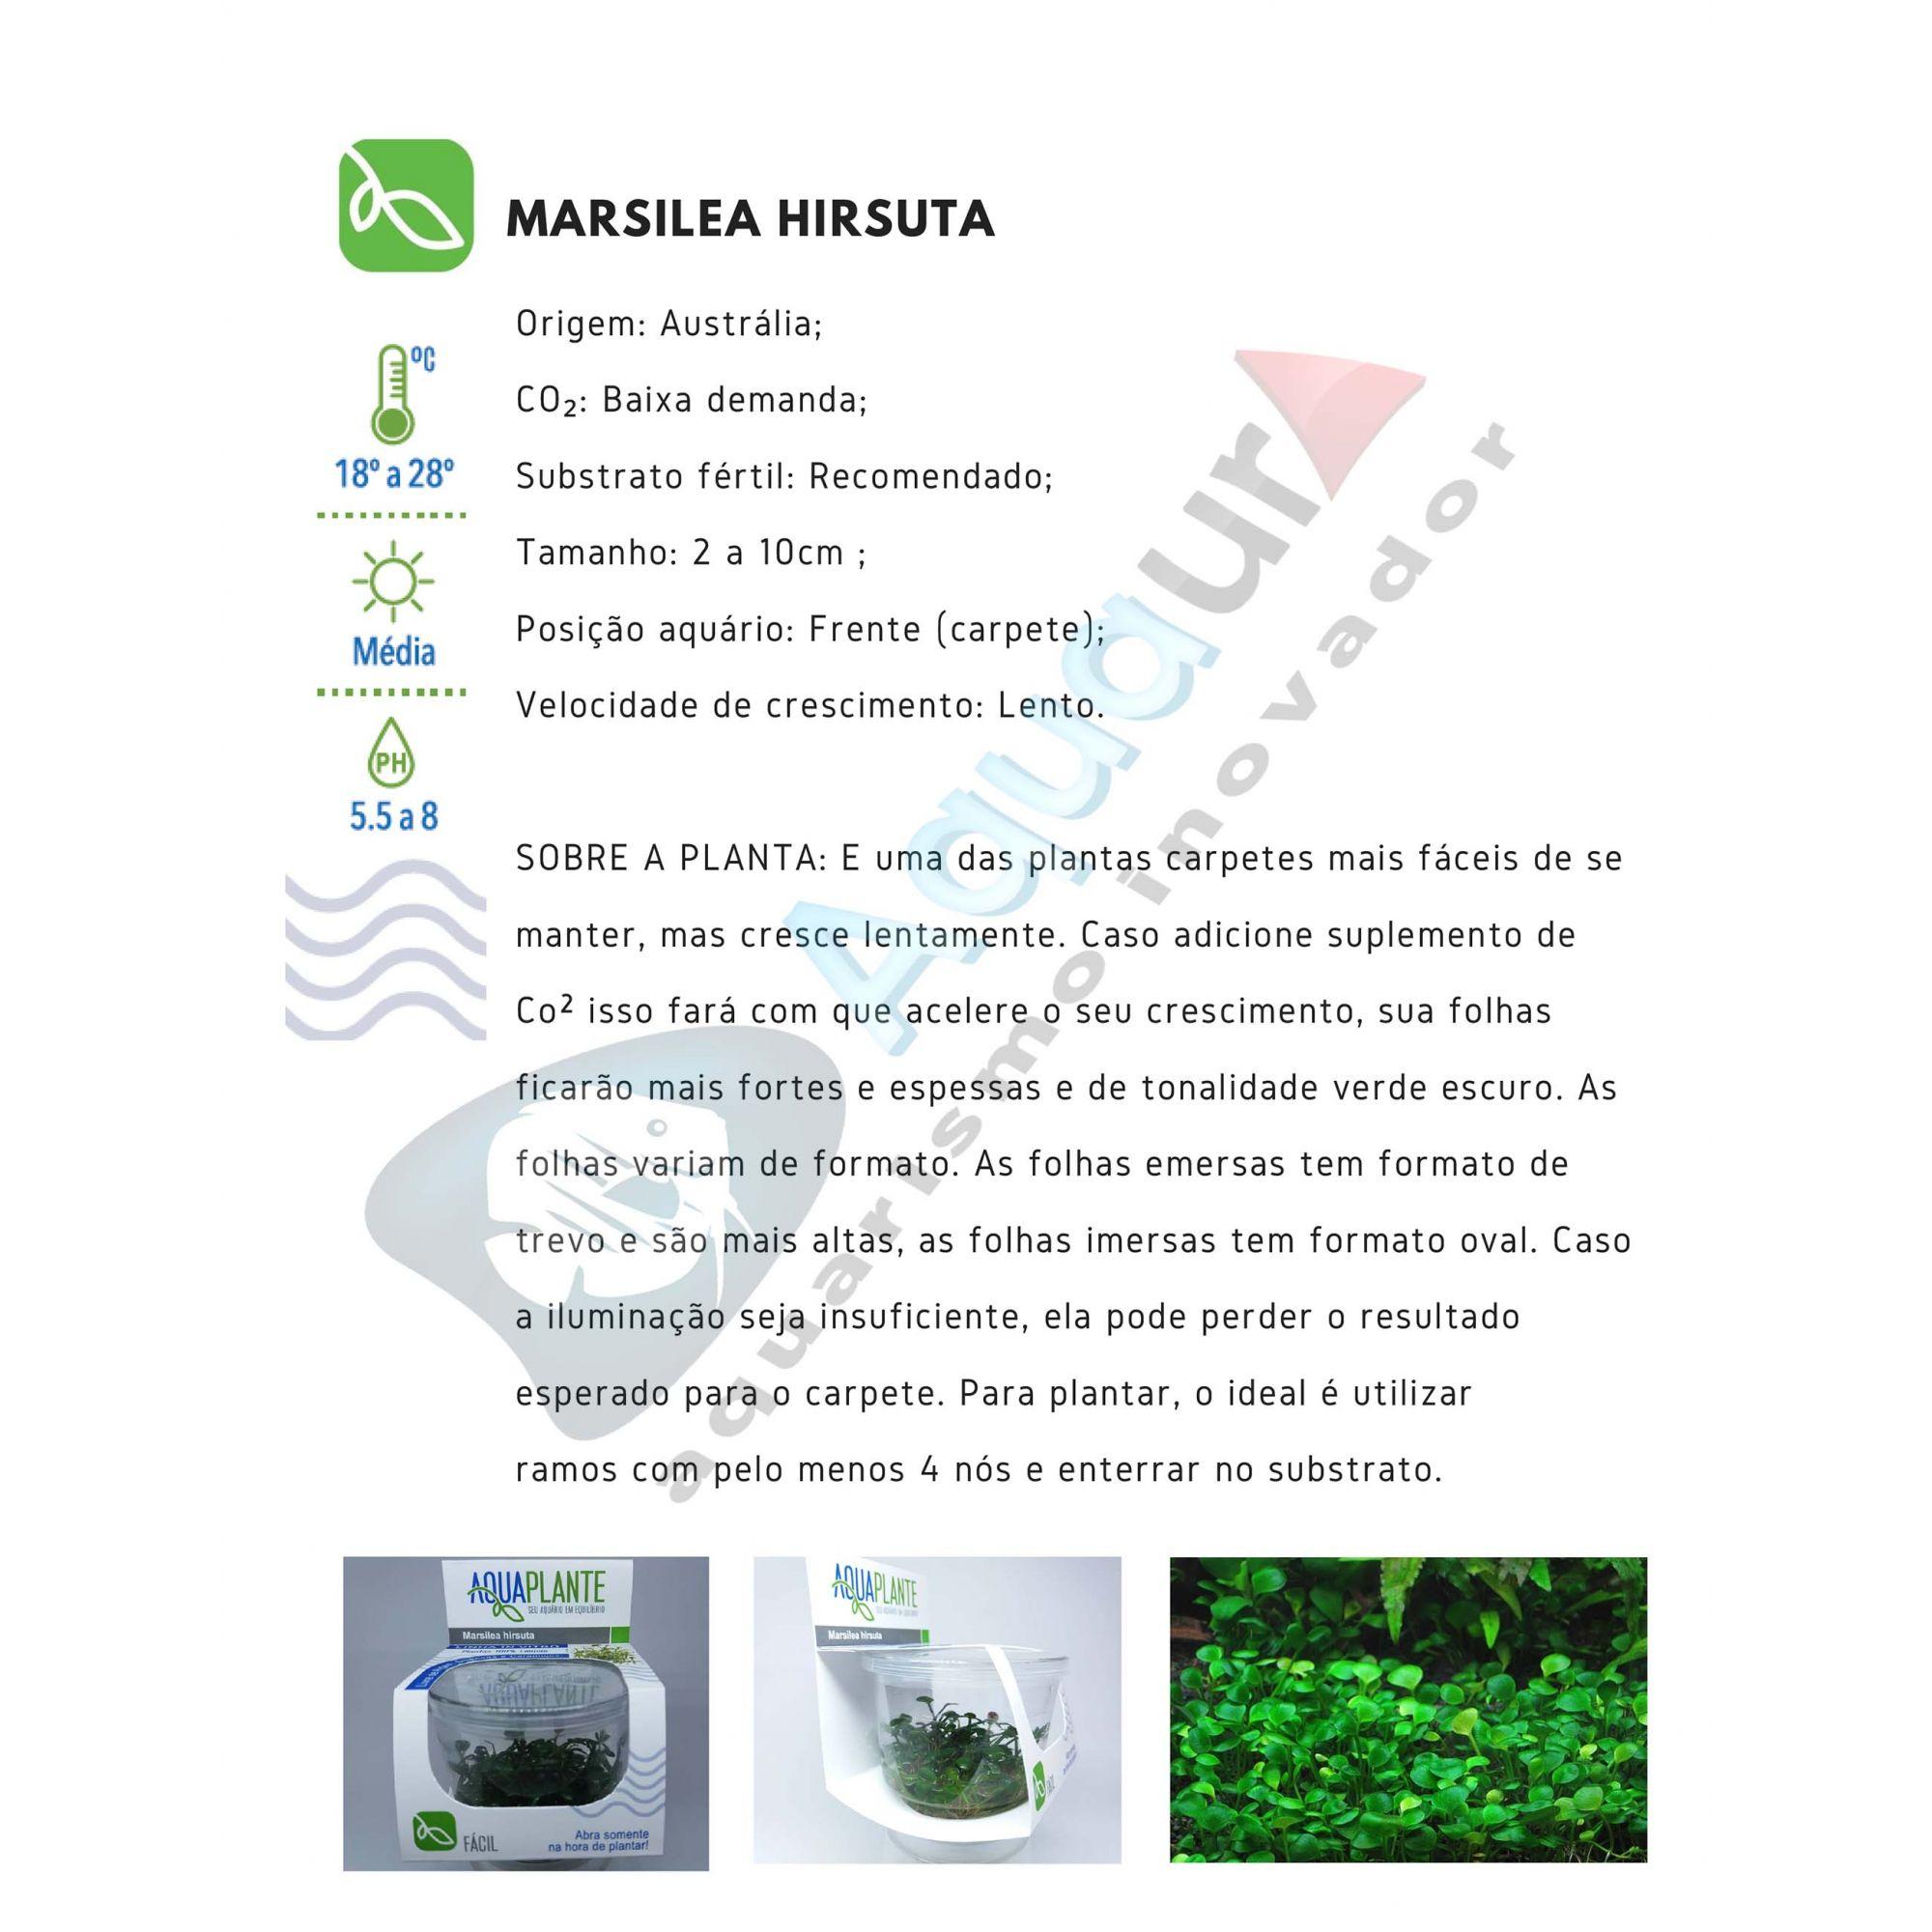 PLANTA NATURAL MARSILEA HIRSUTA - AQUAPLANTE